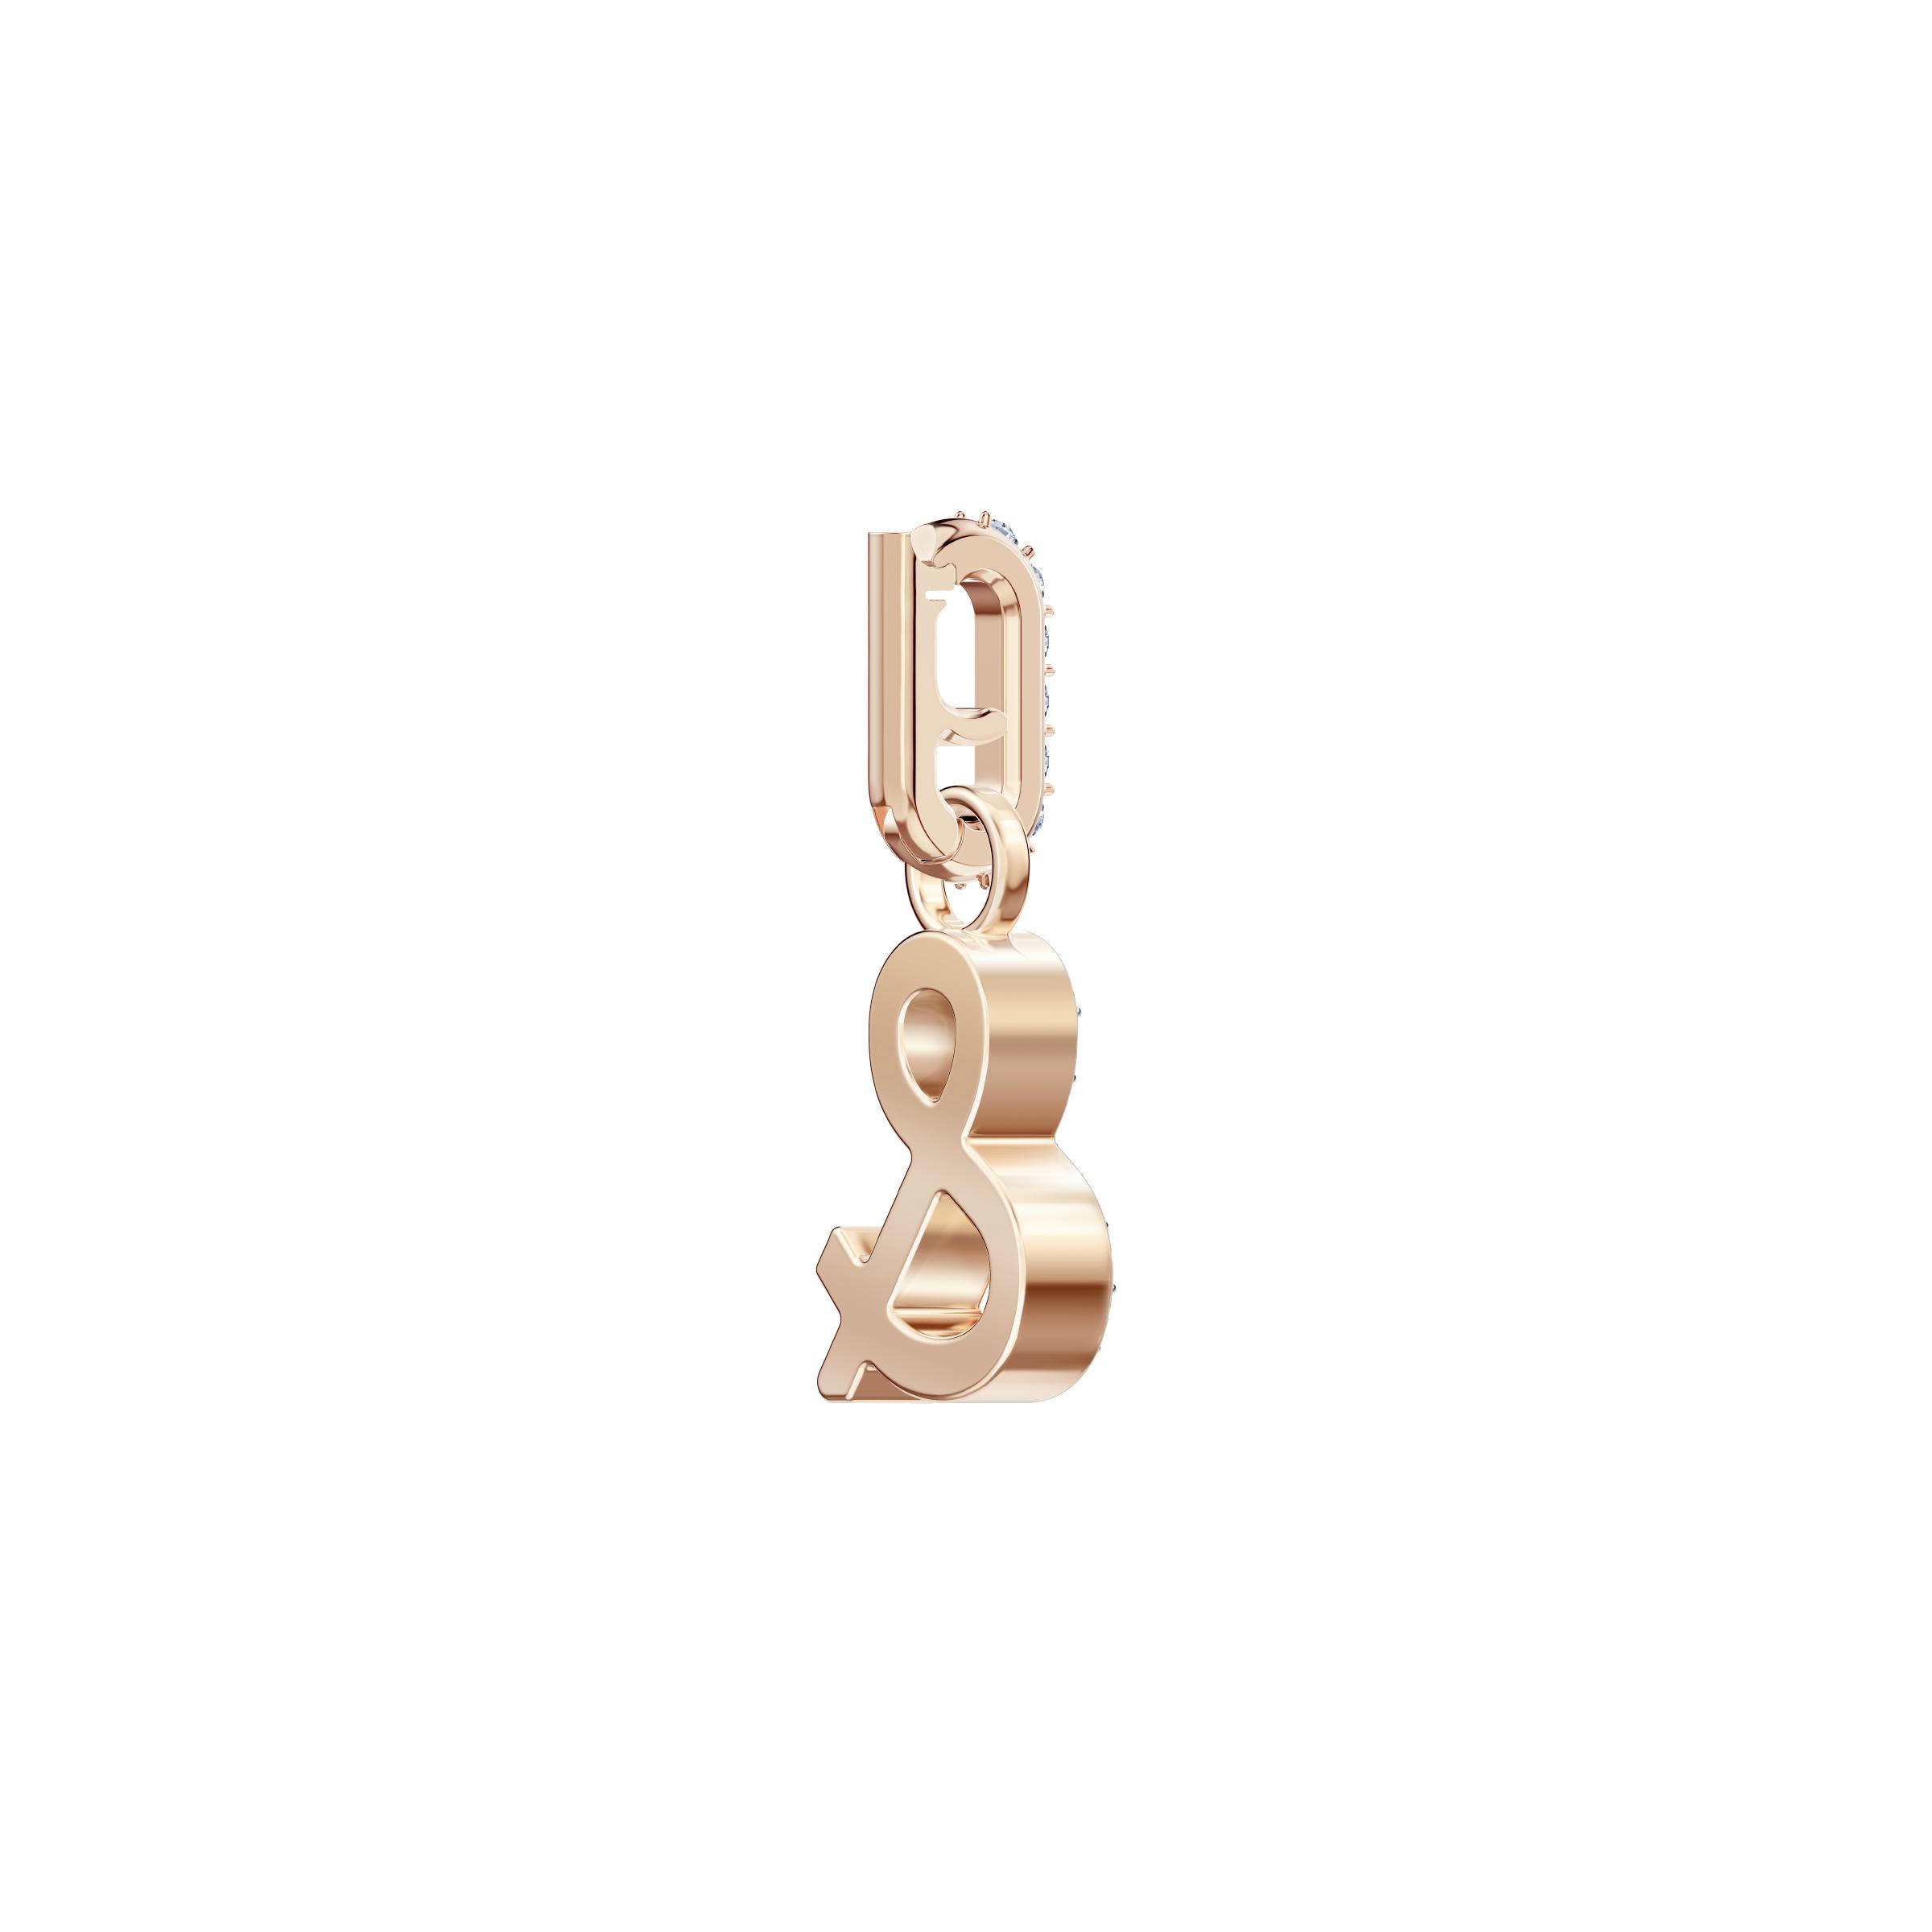 Swarovski Remix Collection Charm &, White, Rose gold plating